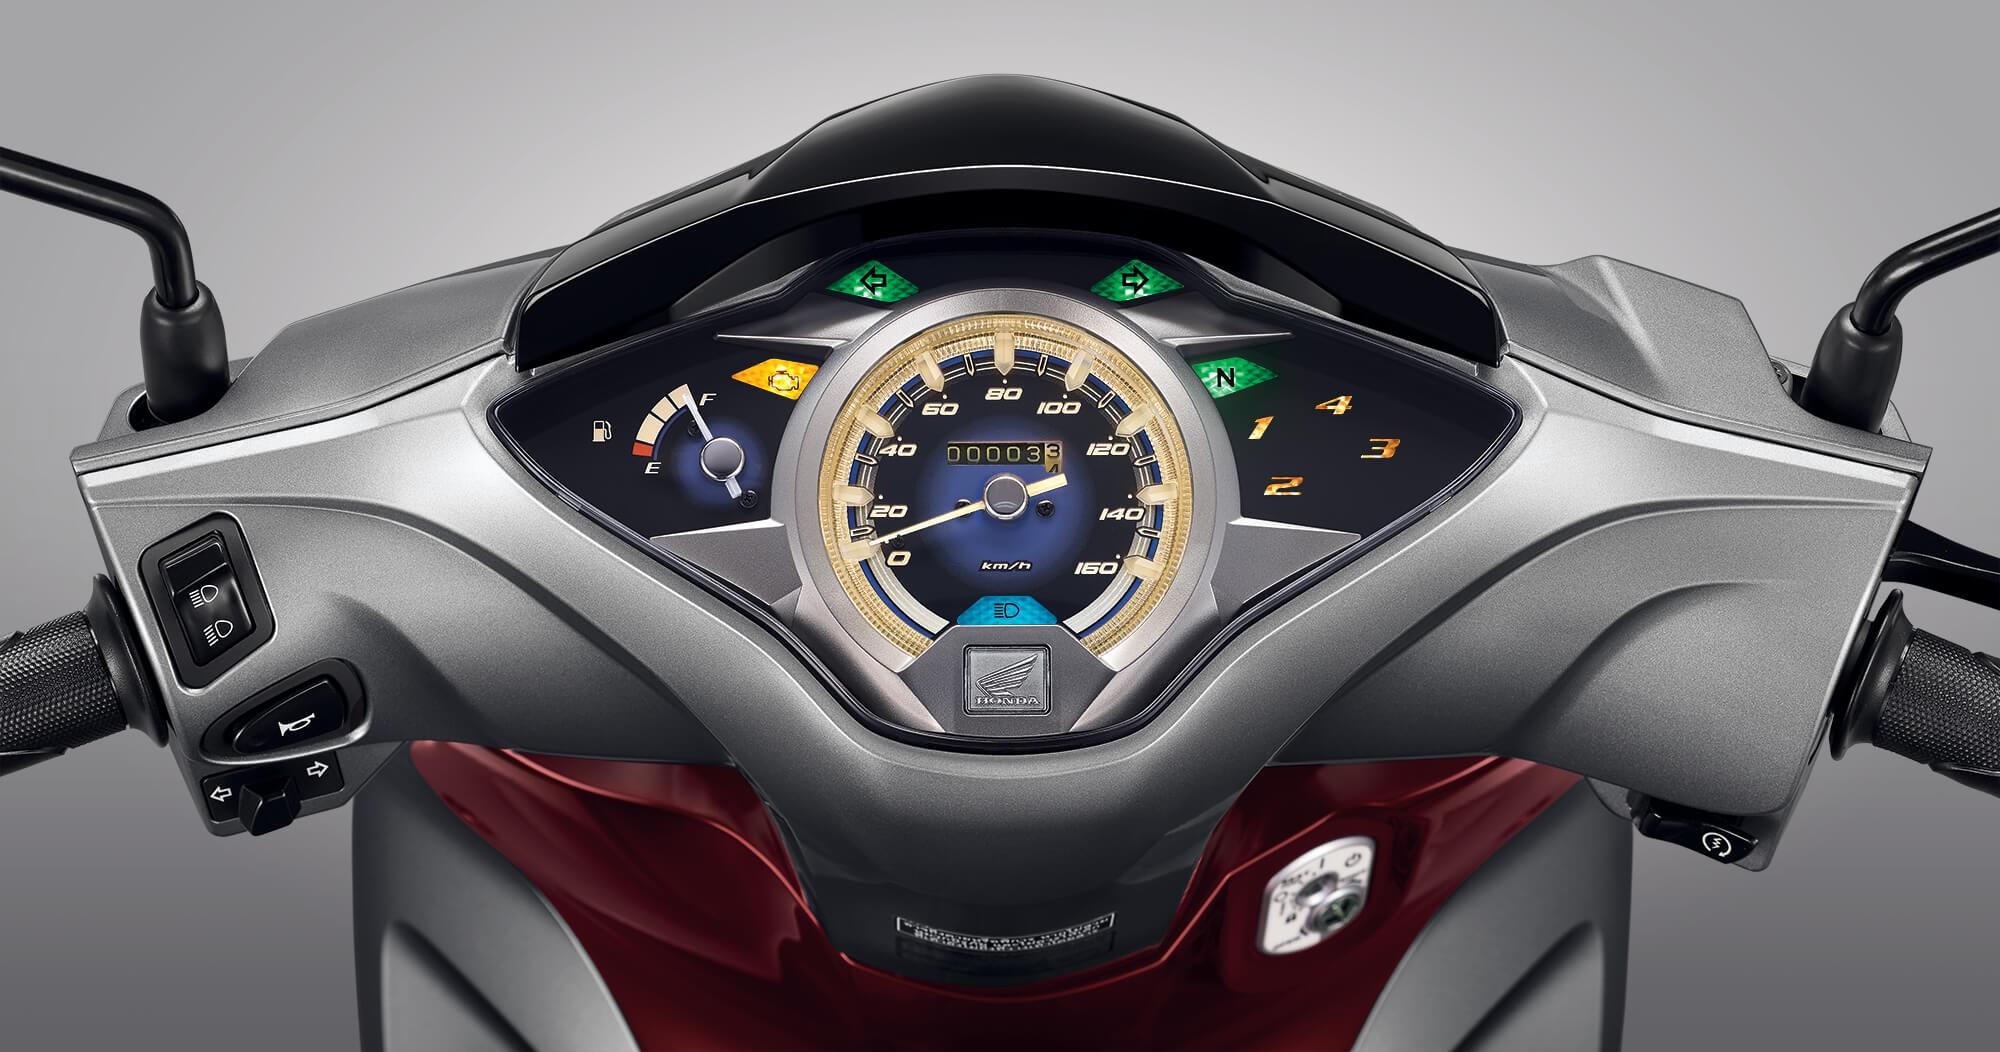 Honda-Motorcycle-มอเตอร์ไซค์-ฮอนด้า-20180821-ข่าวผลิตภัณฑ์-AllNewHondaWave125i